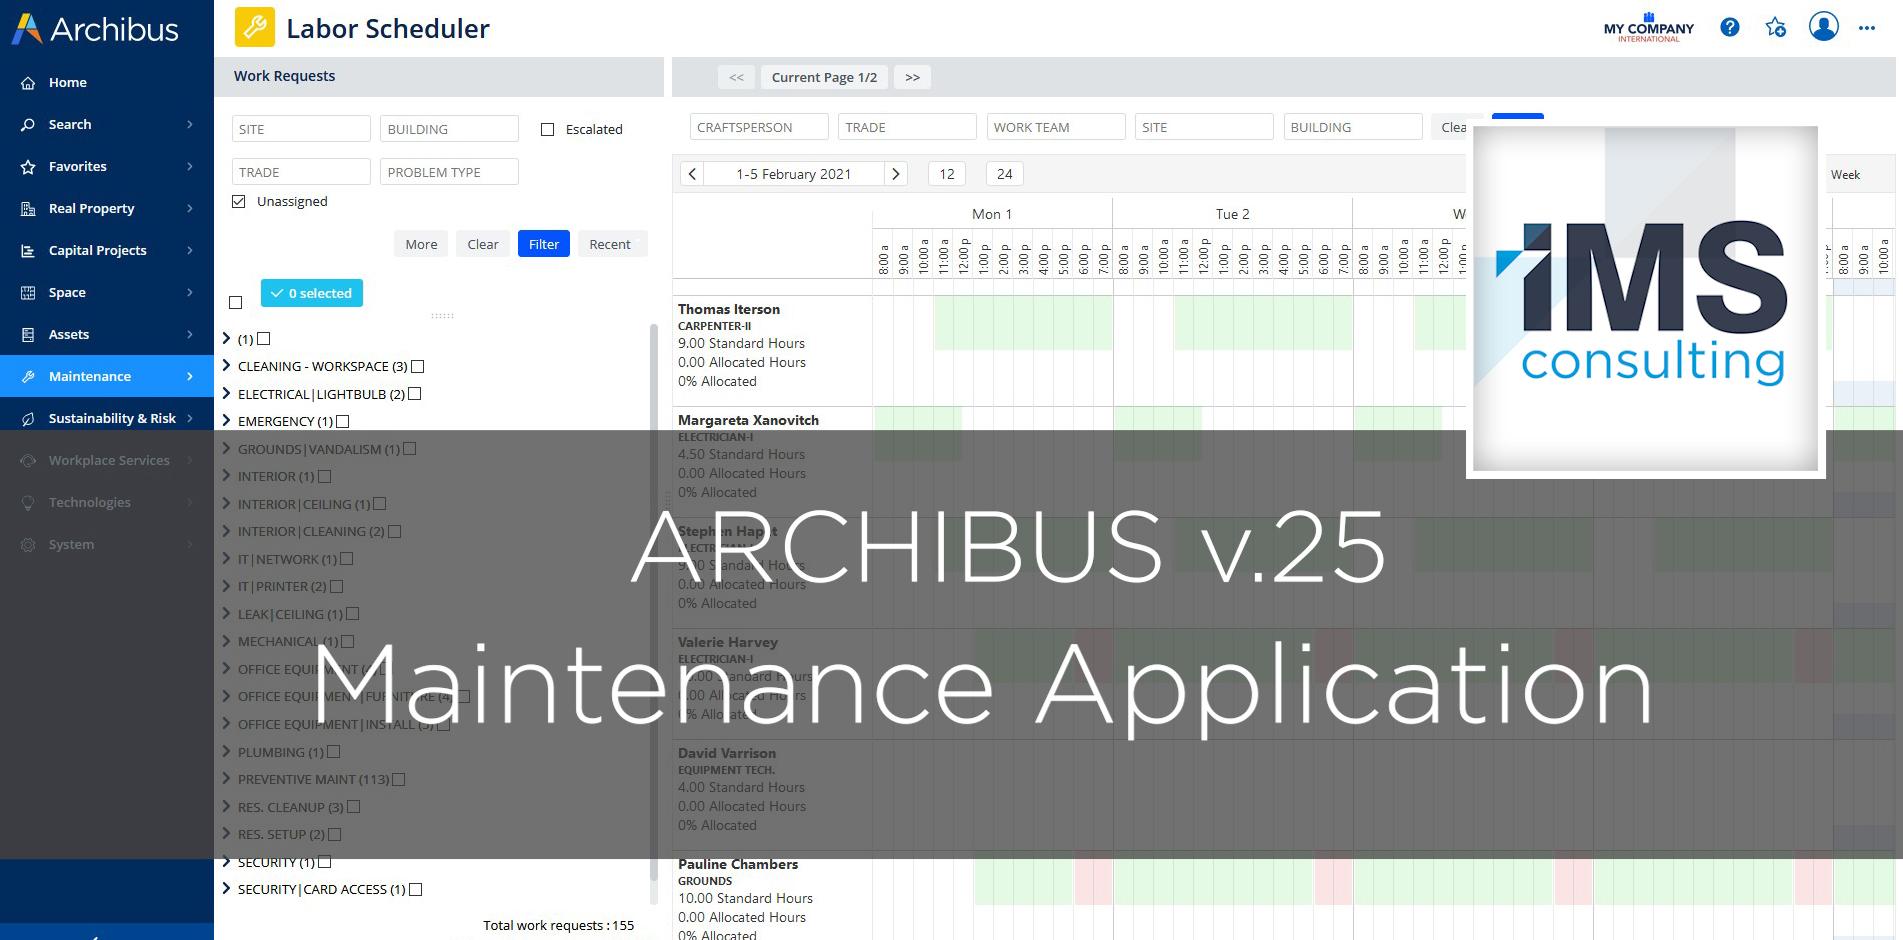 Archibus Maintenance v.25 - IMS Consulting